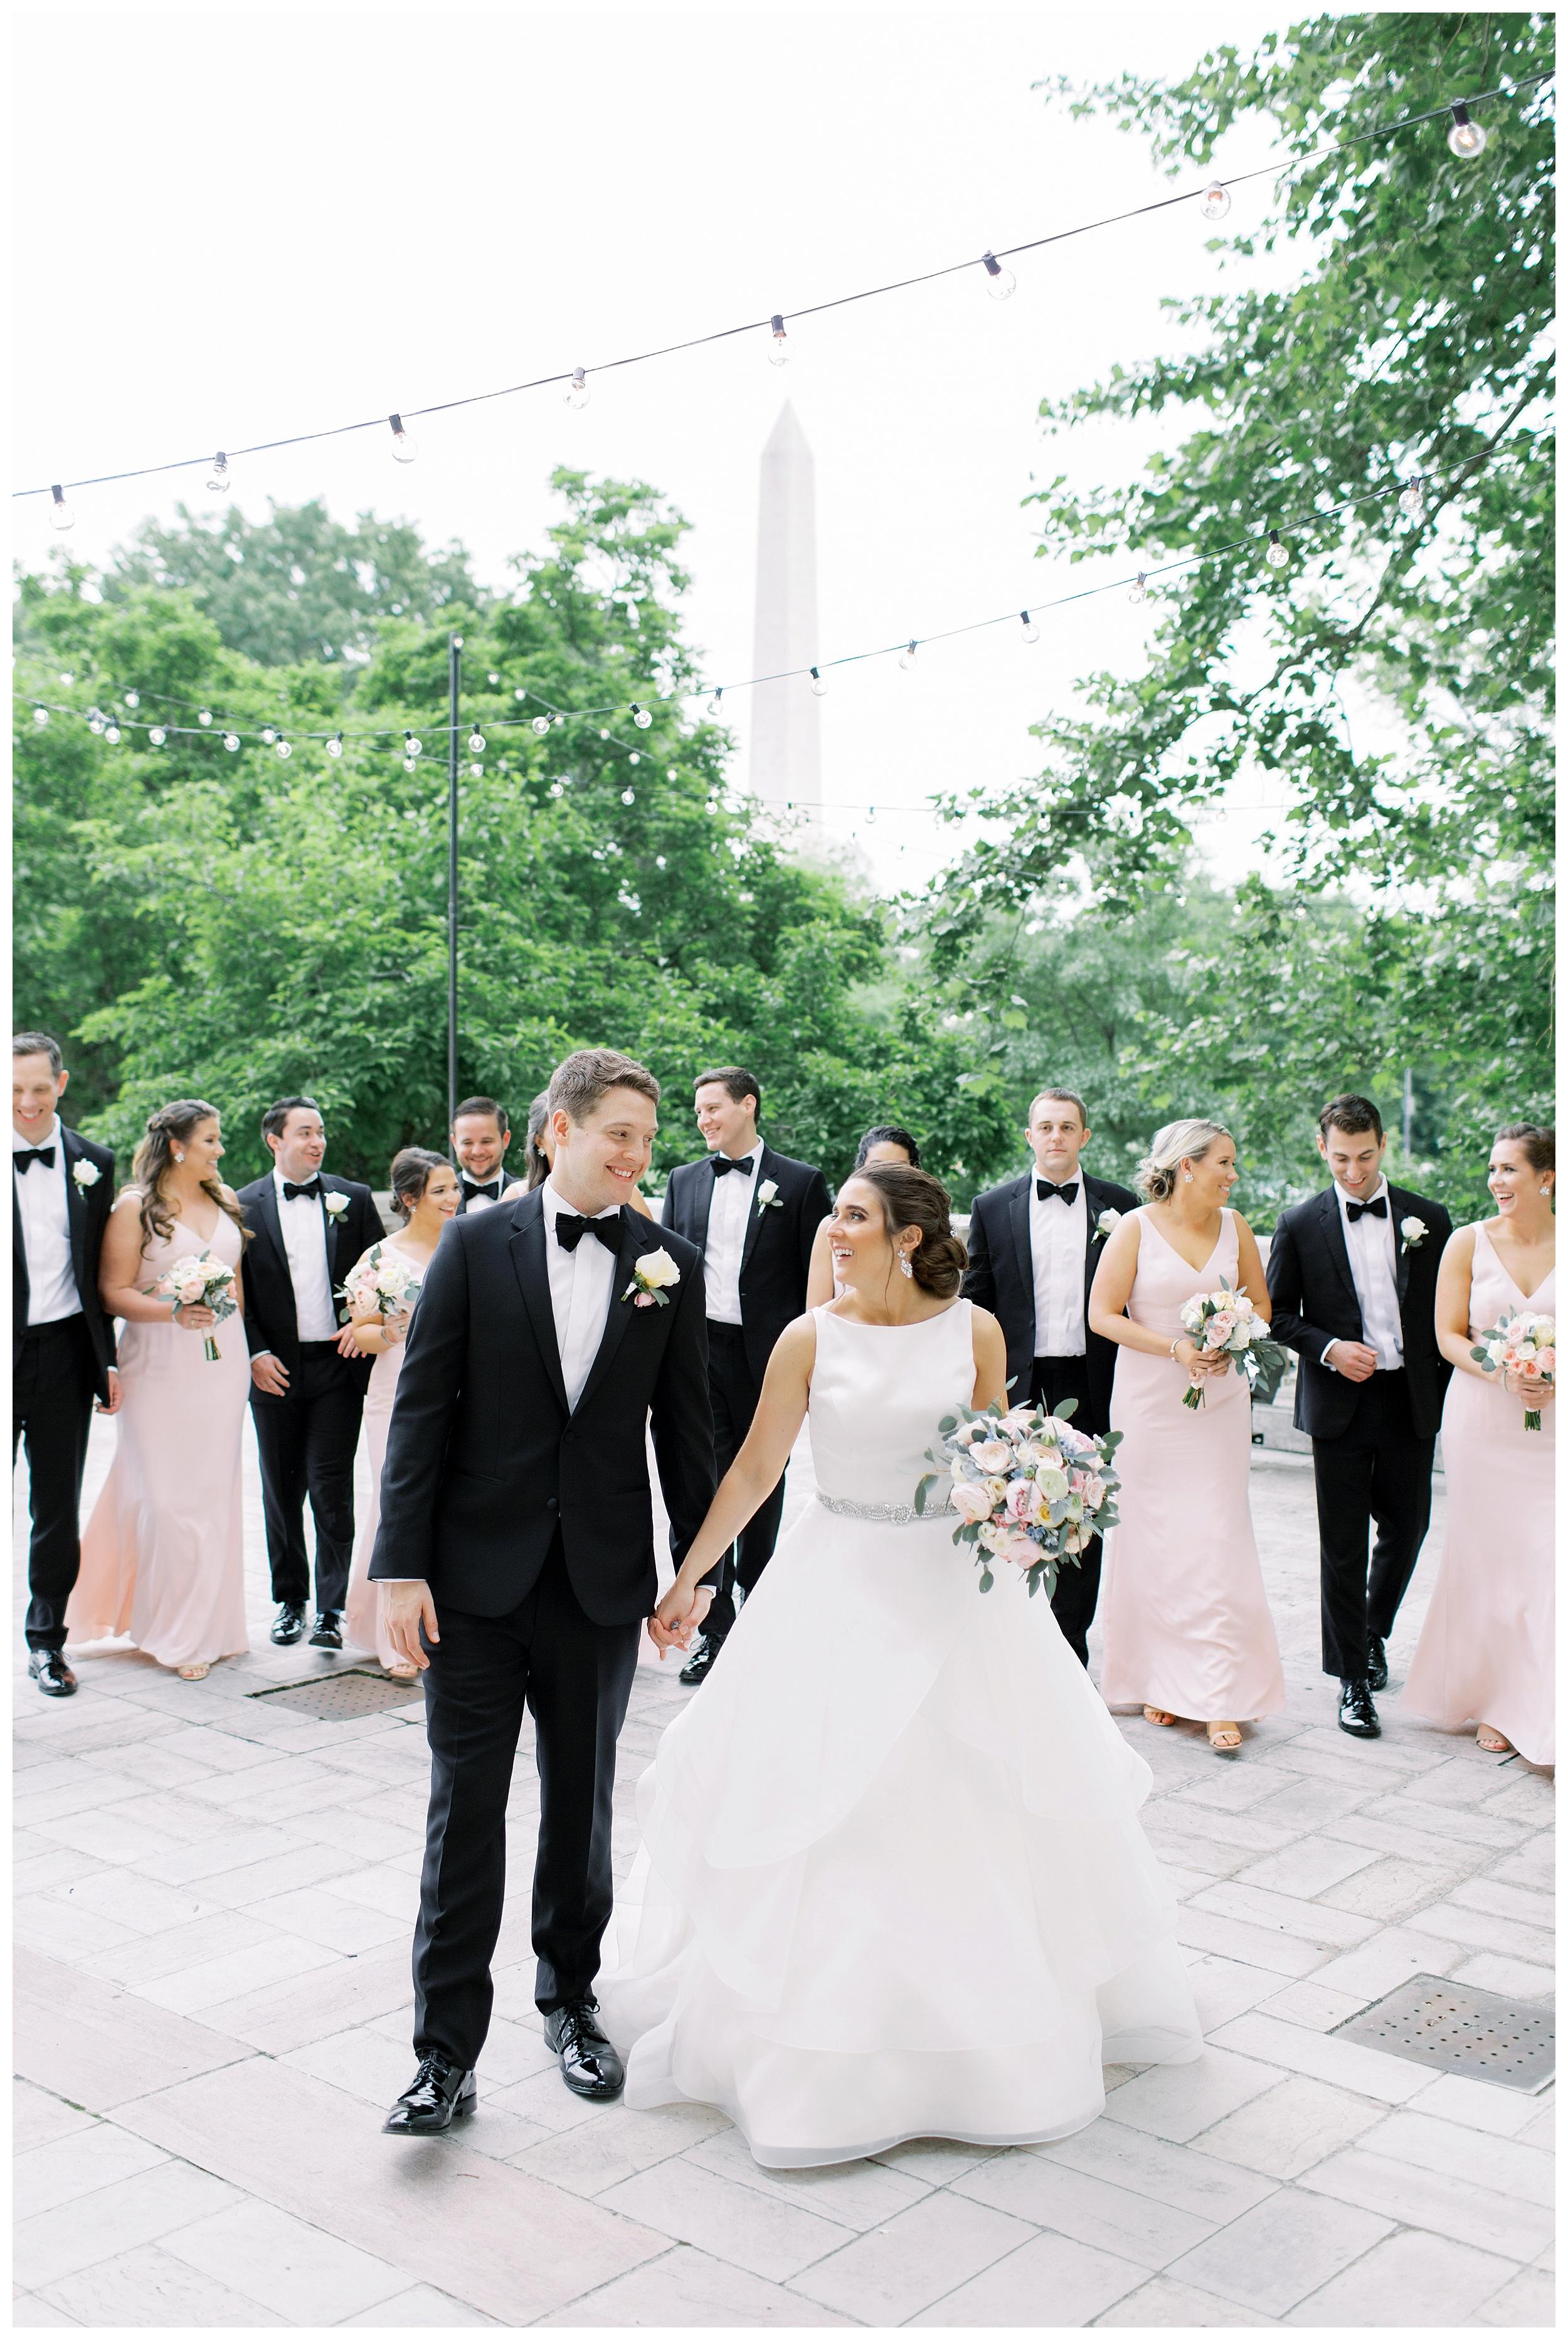 DAR Constitution Hall Wedding Wedding | Daughters of the American Revolution Wedding | District of Columbia Film Wedding Photographer Kir Tuben_0074.jpg